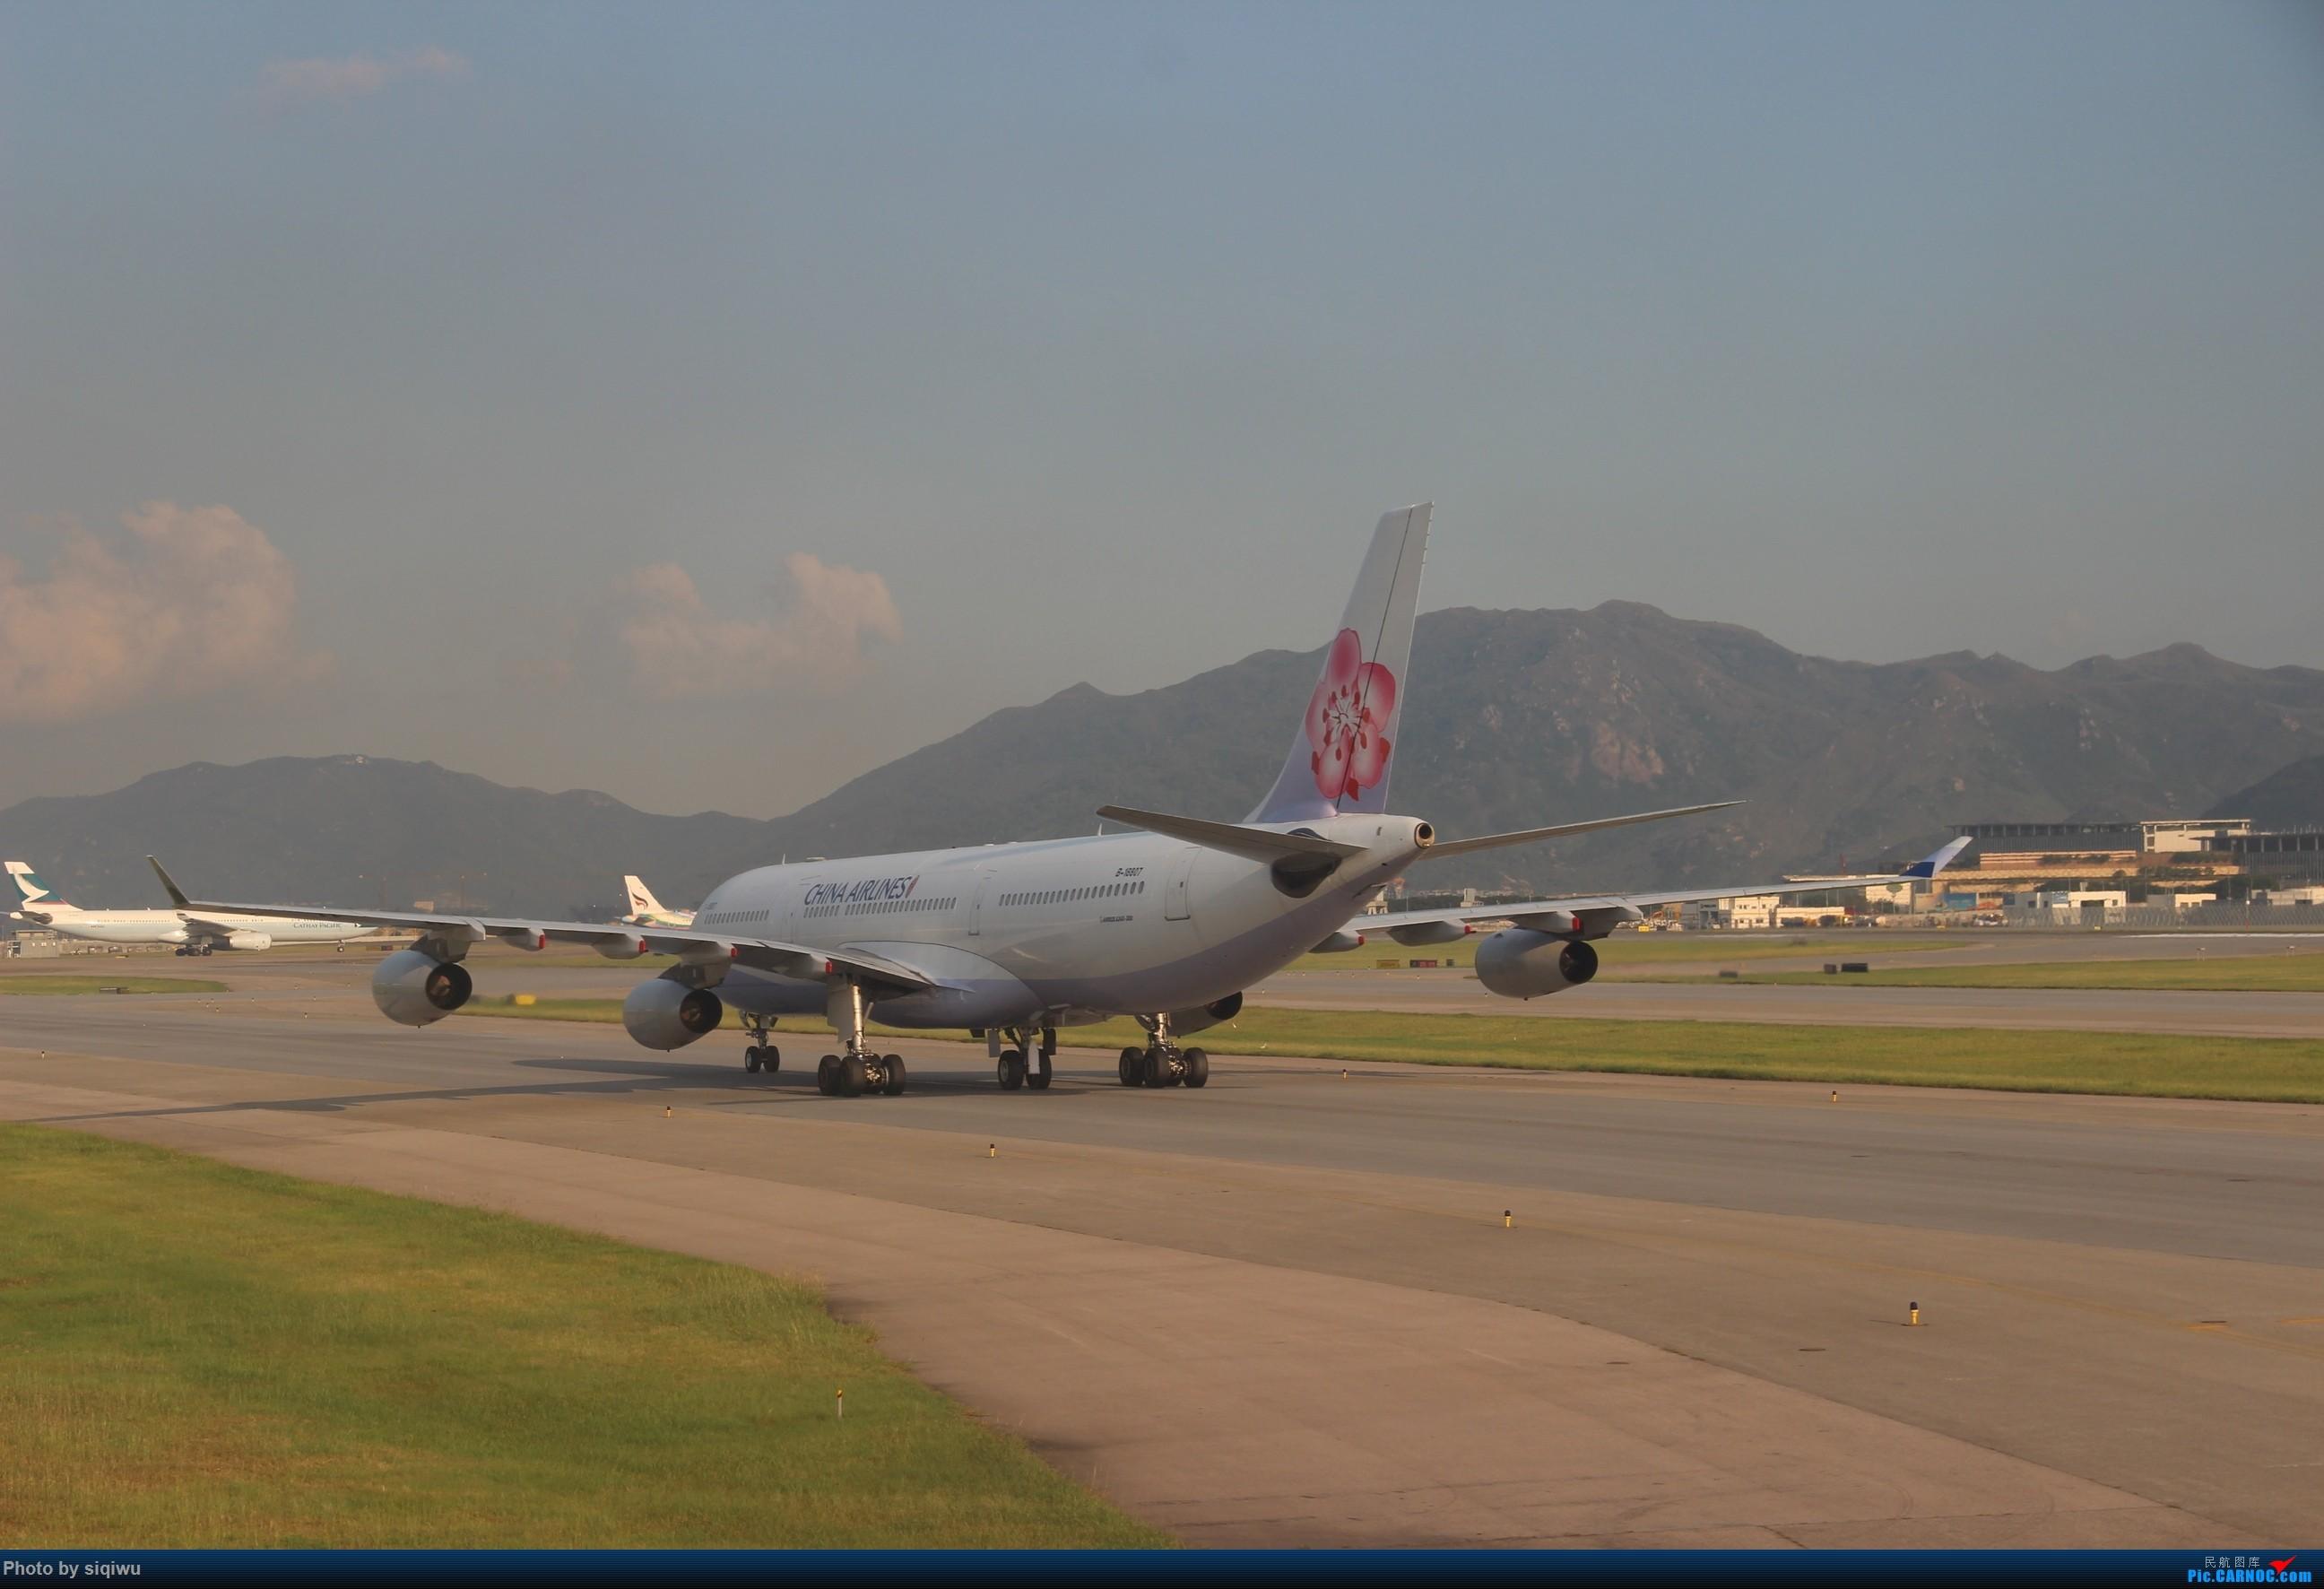 Re:[原创]PVG-HKG-KUL-HKG-PVG 四天往返,CX/KA AIRBUS A340-300  中国香港国际机场